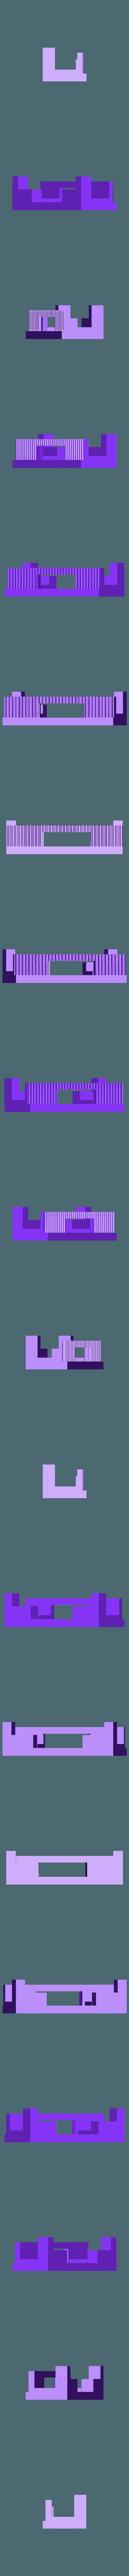 PCB_2_v57_PCB_2_v57_Component19_1_Body35_Component19.stl Télécharger fichier STL gratuit Cyclone PCB Factory Dual Z-axis • Objet pour impression 3D, TinkersProjects